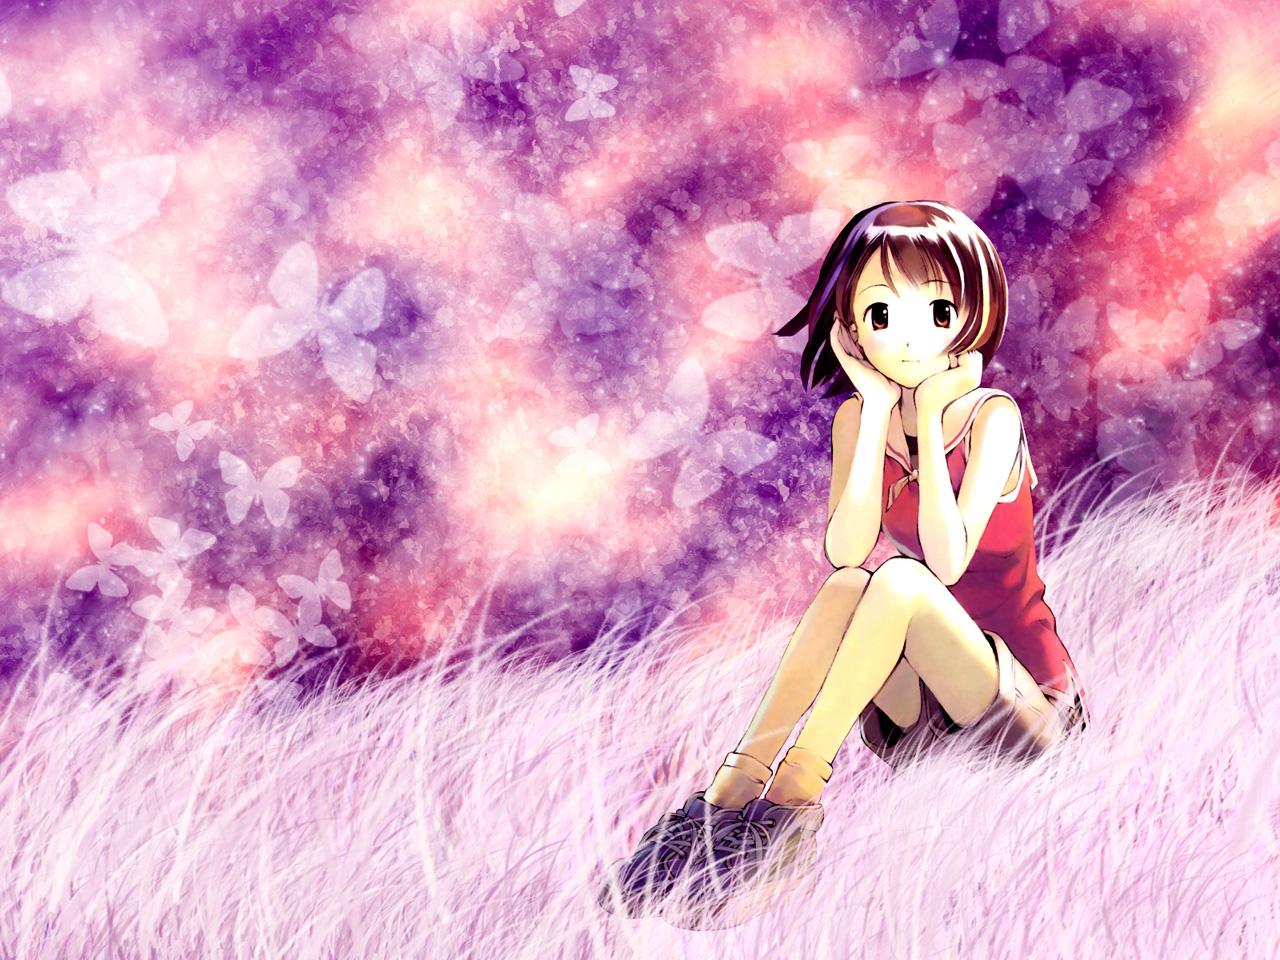 desktop wallpaper of cute anime girl computer desktop wallpaper 1280x960